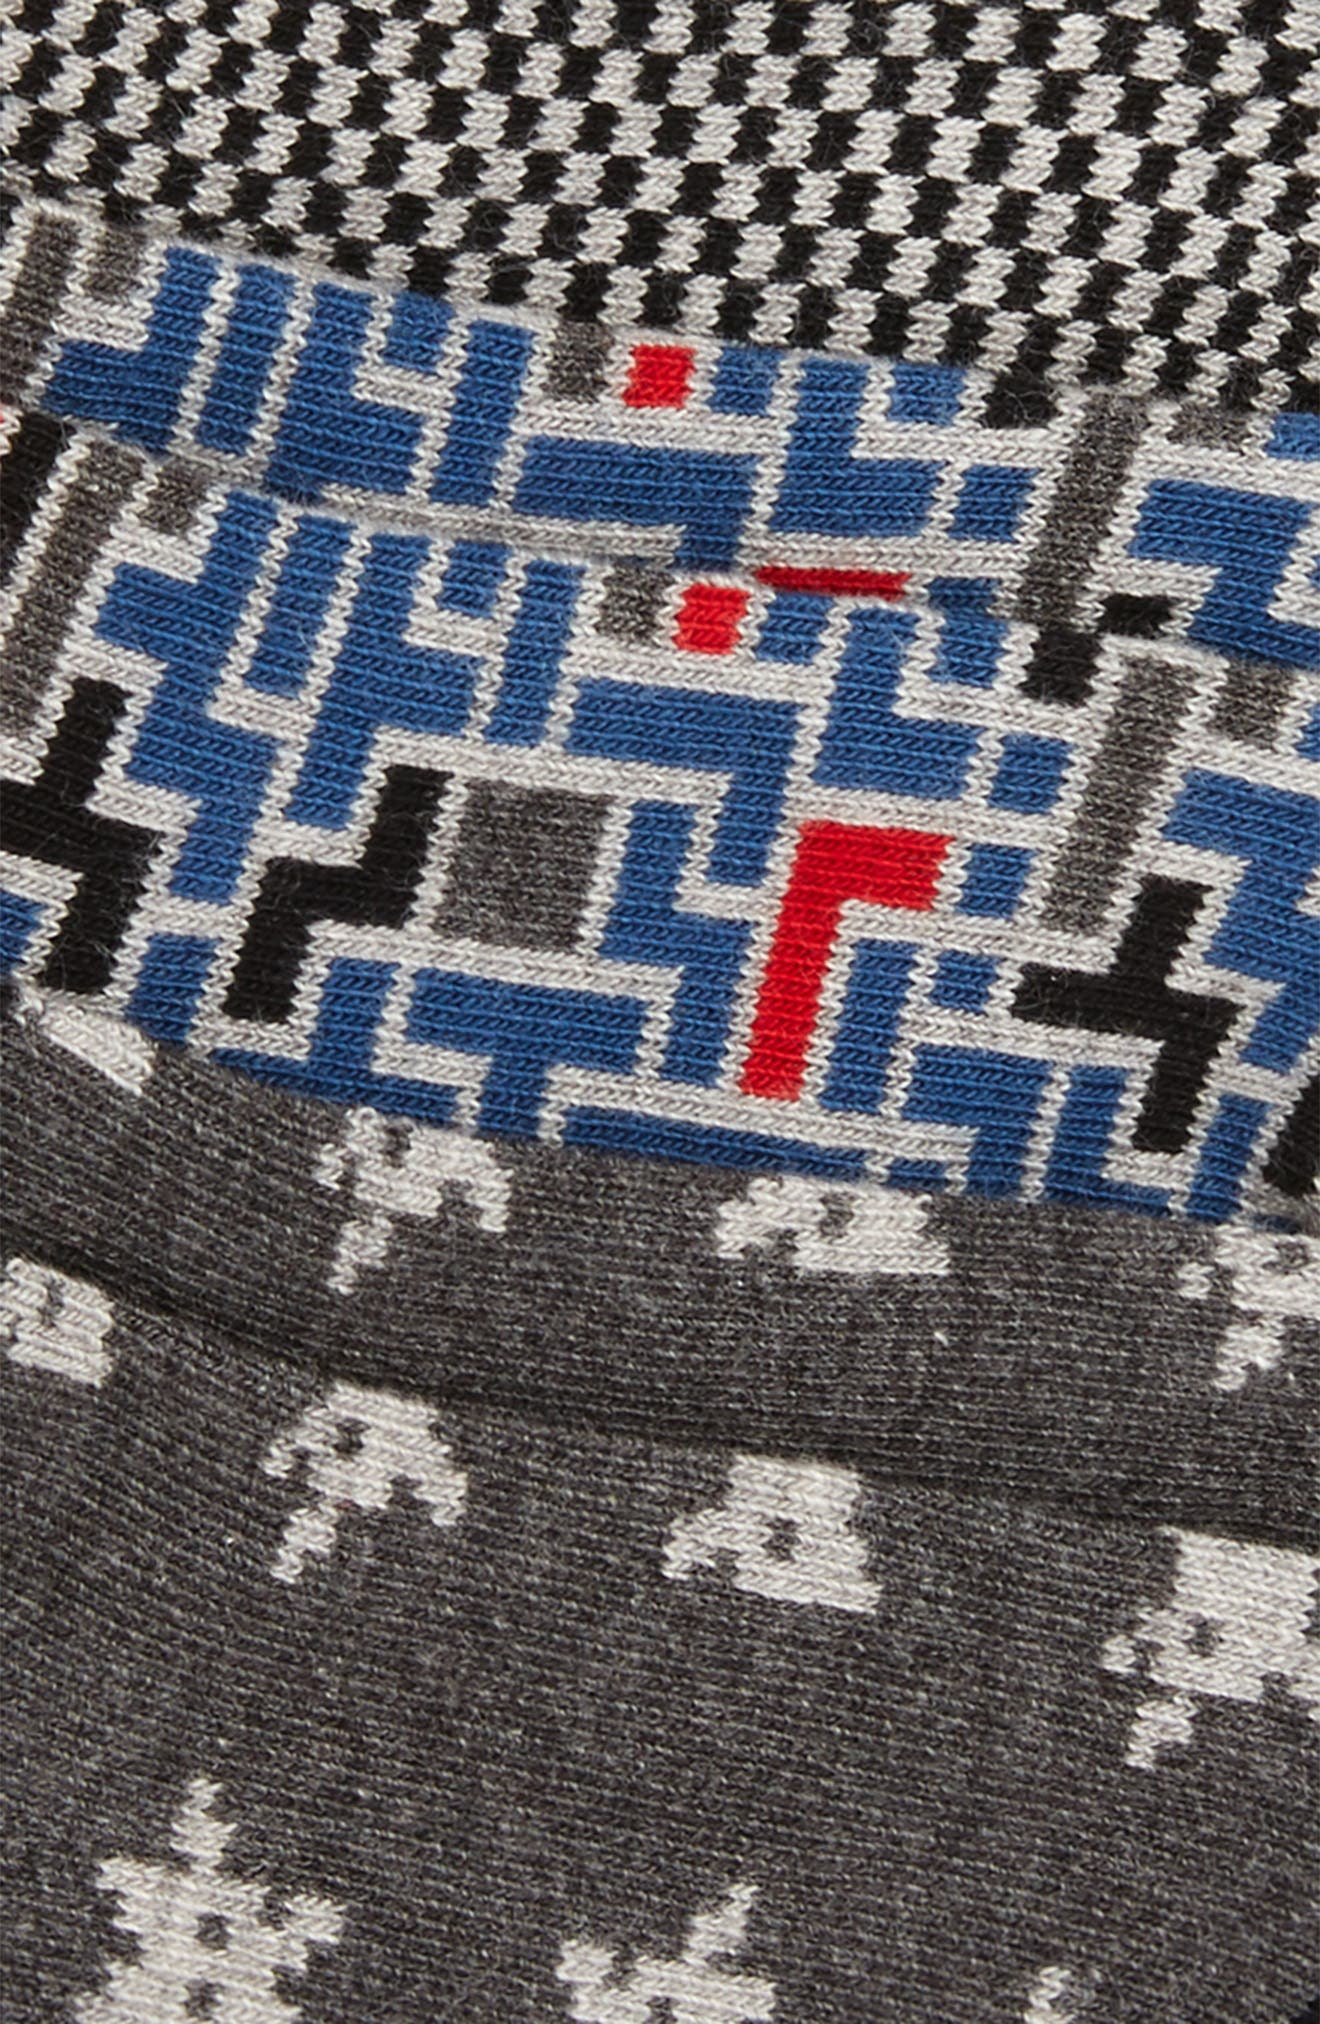 Digital Alien 6-Pack Low Cut Socks,                             Alternate thumbnail 2, color,                             002